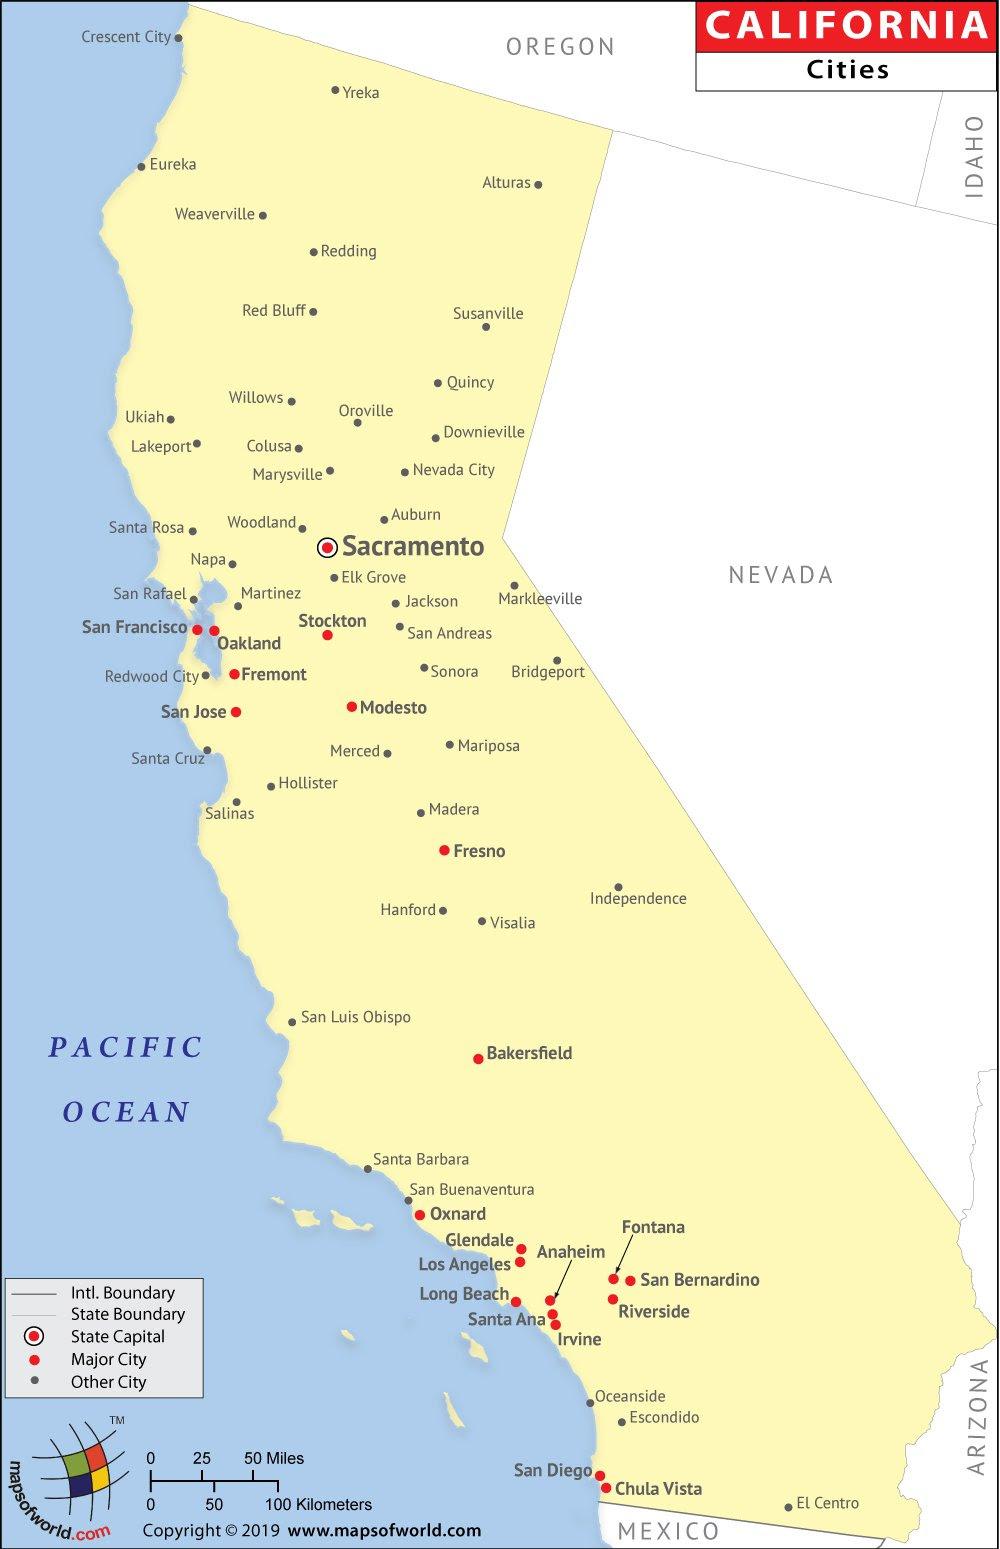 Map Of California Major Cities California Major Cities Map ~ COALIZAOUENF